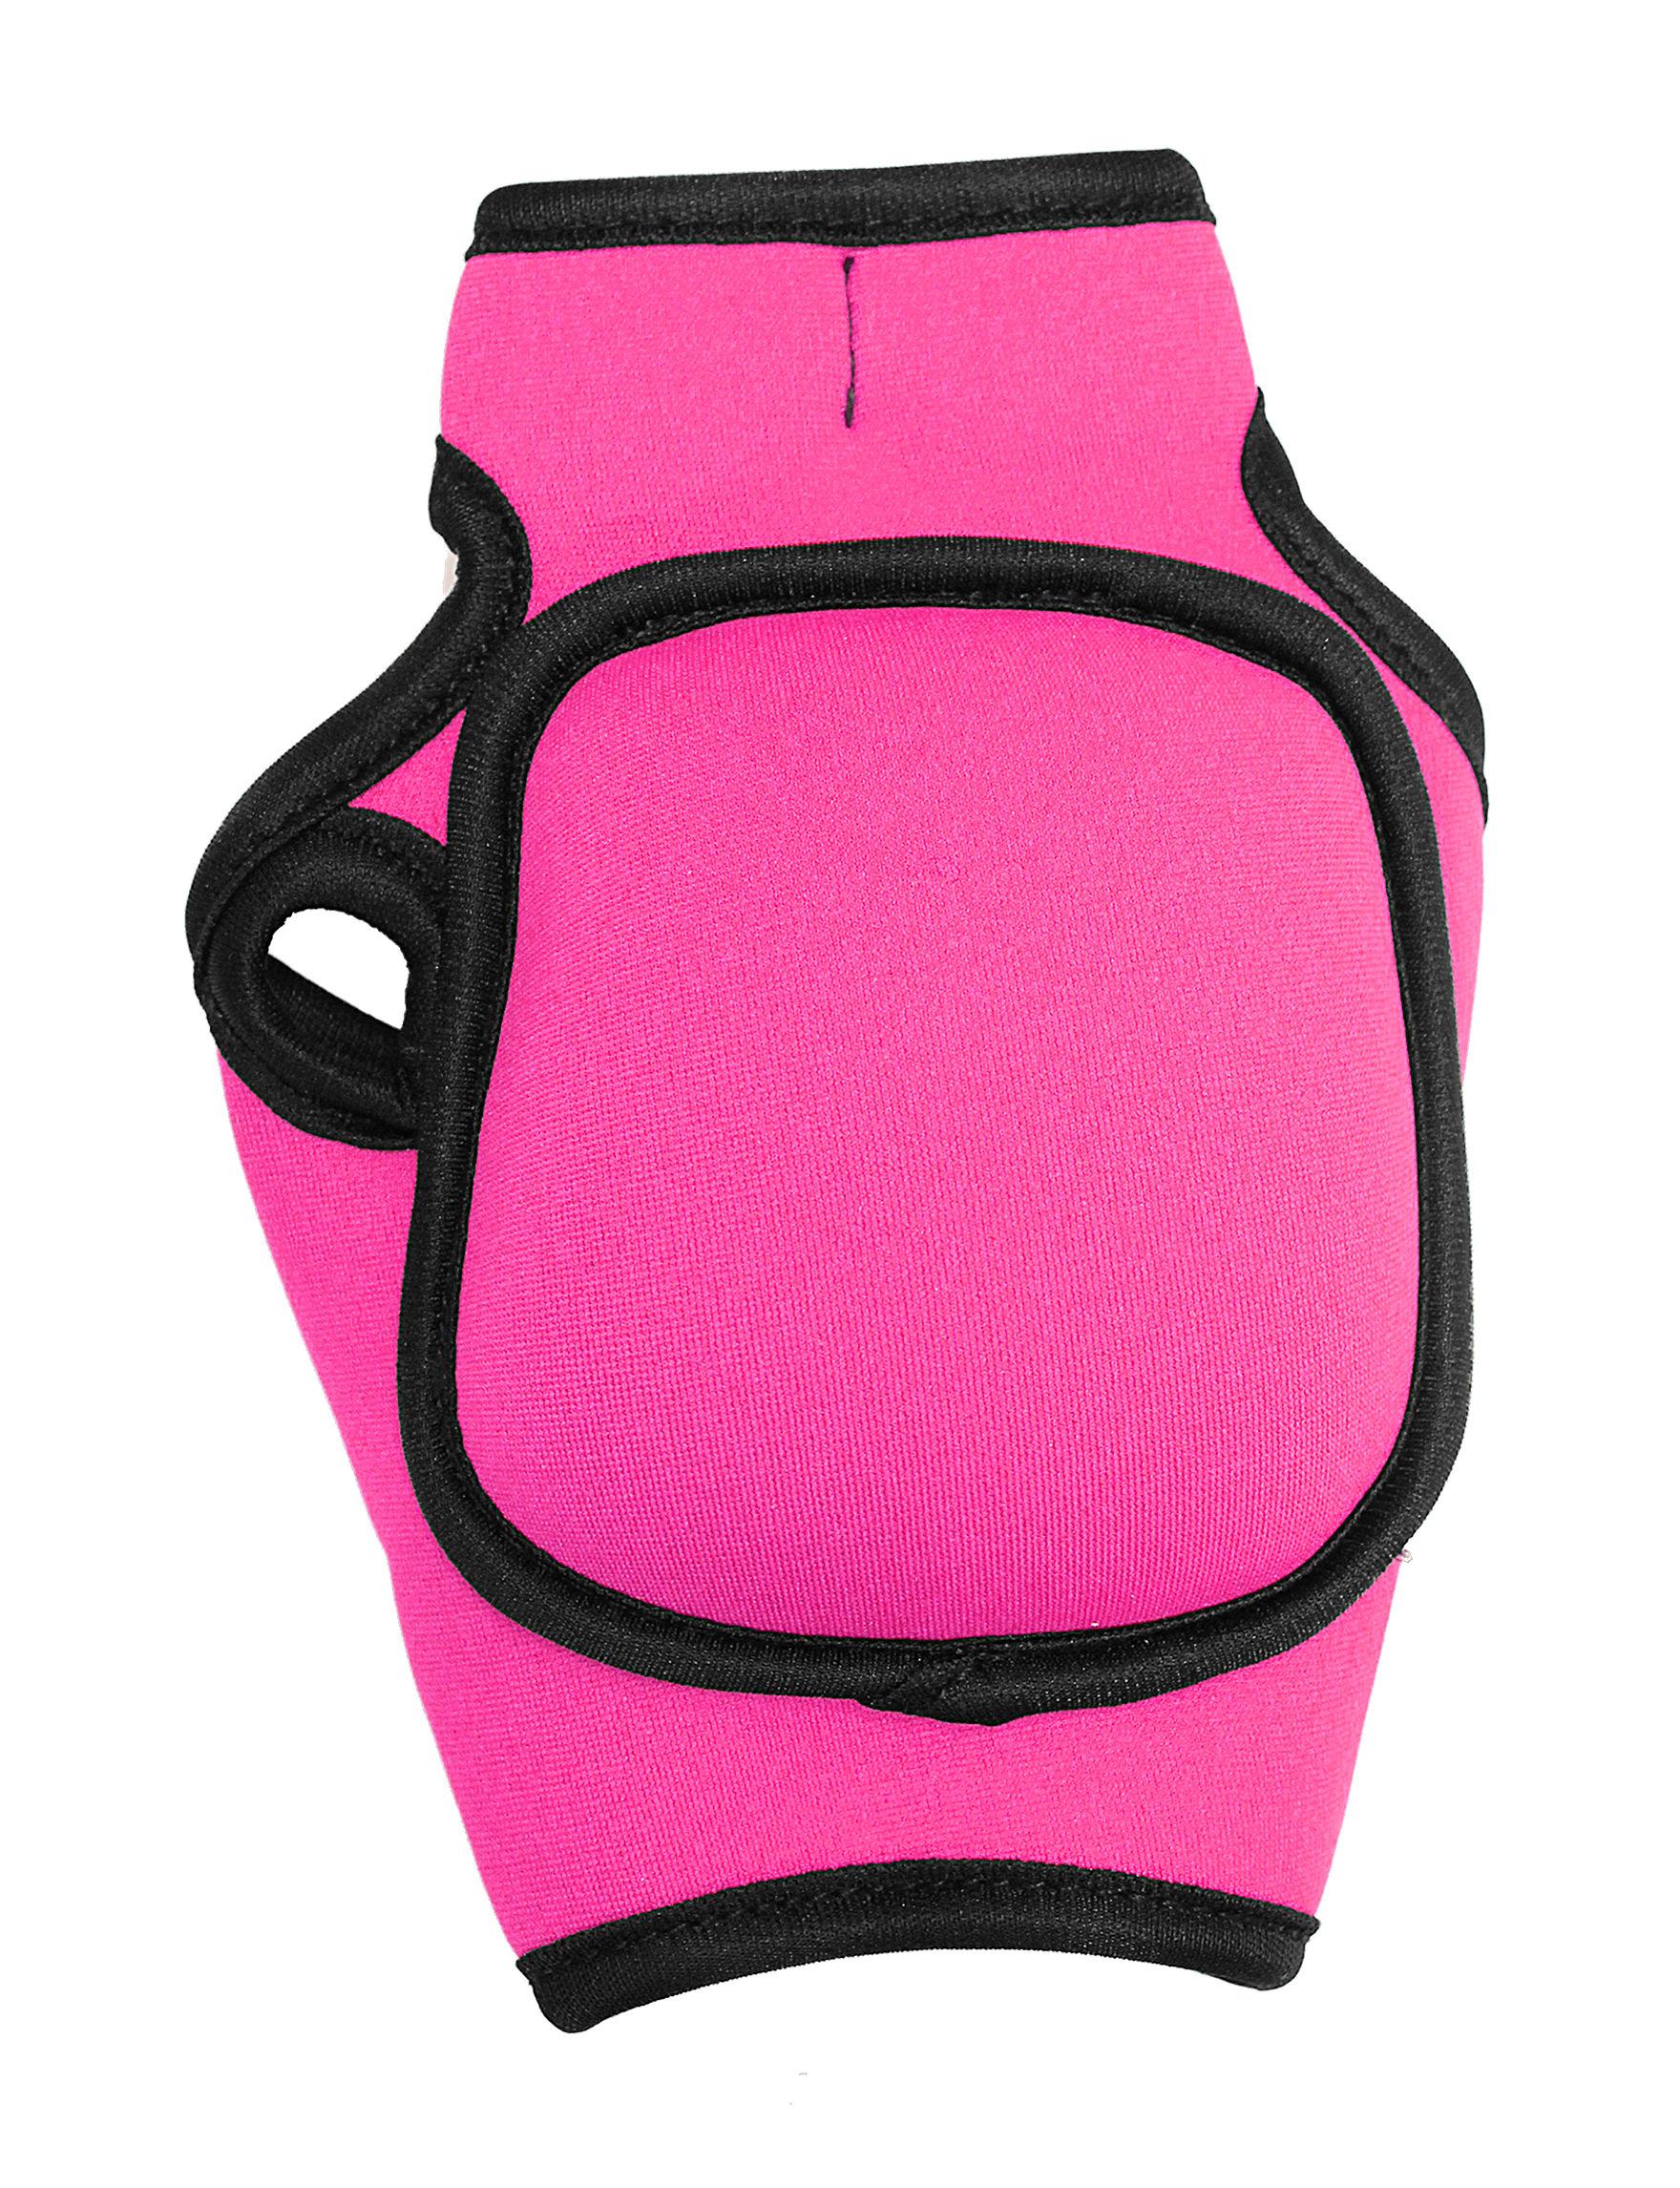 Gourmet Home Pink Fitness Equipment